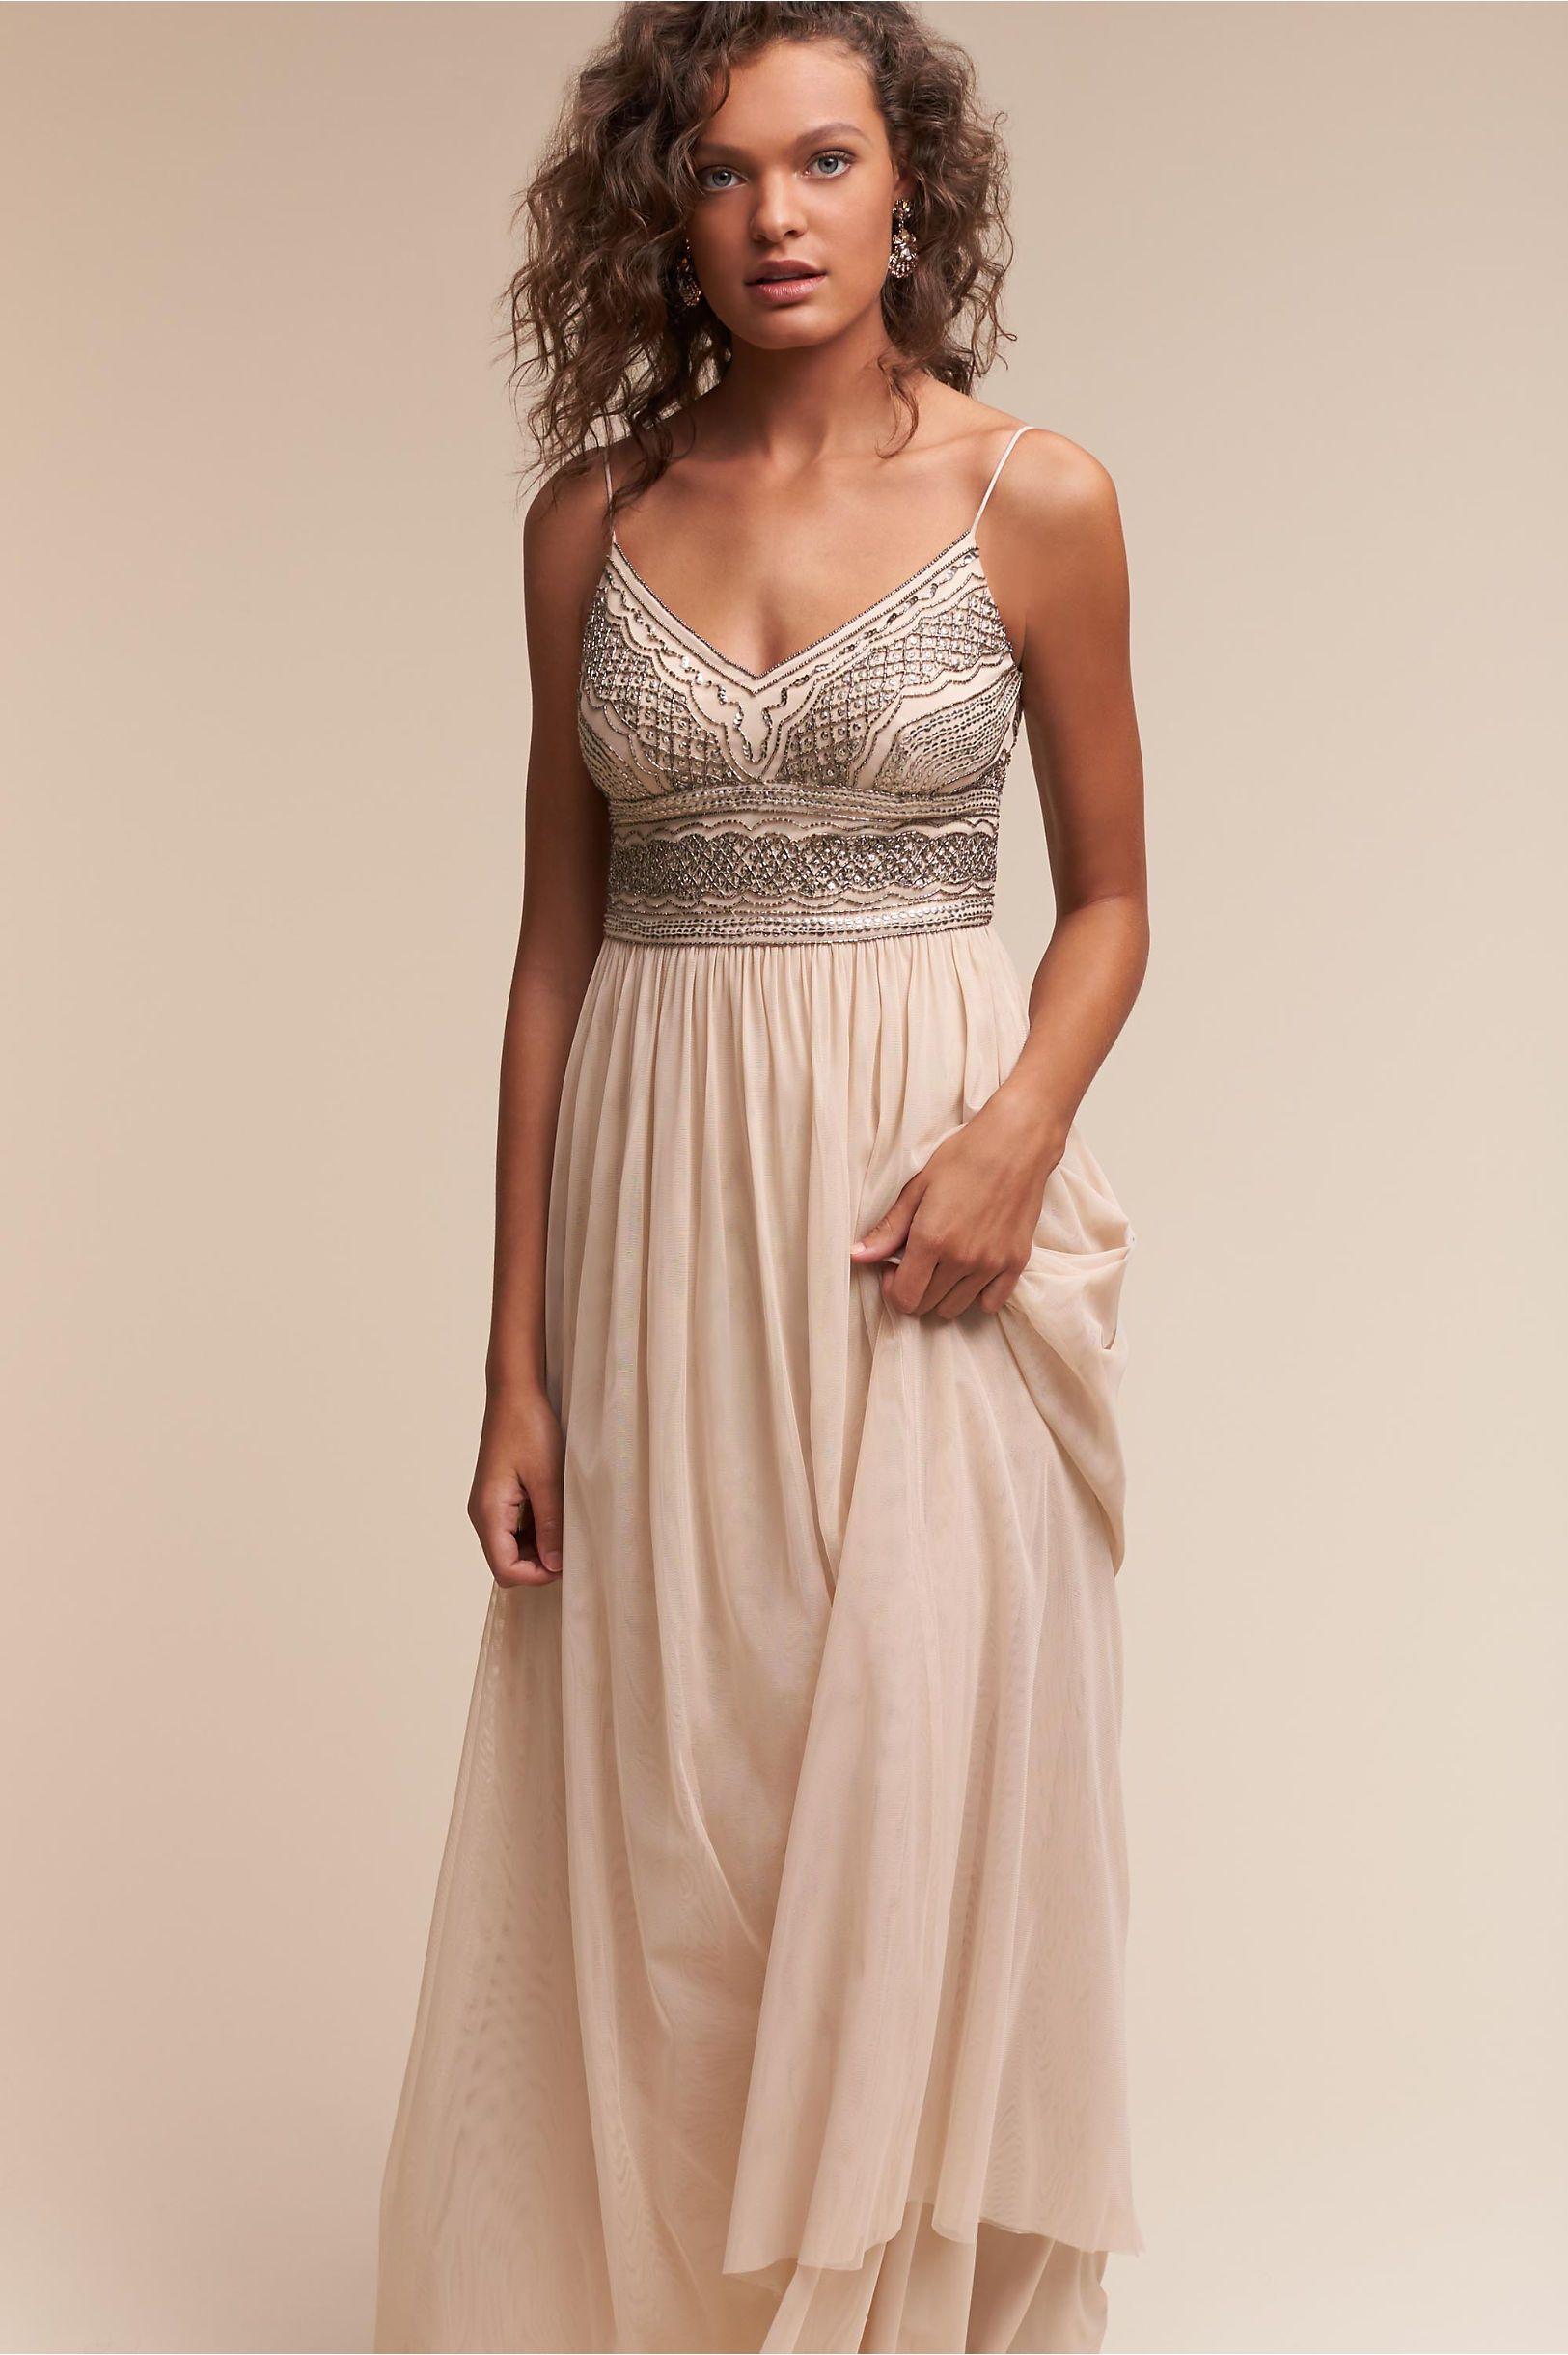 836f821d6def BHLDN Aida Dress in Bridesmaids View All Dresses   BHLDN   ladies ...